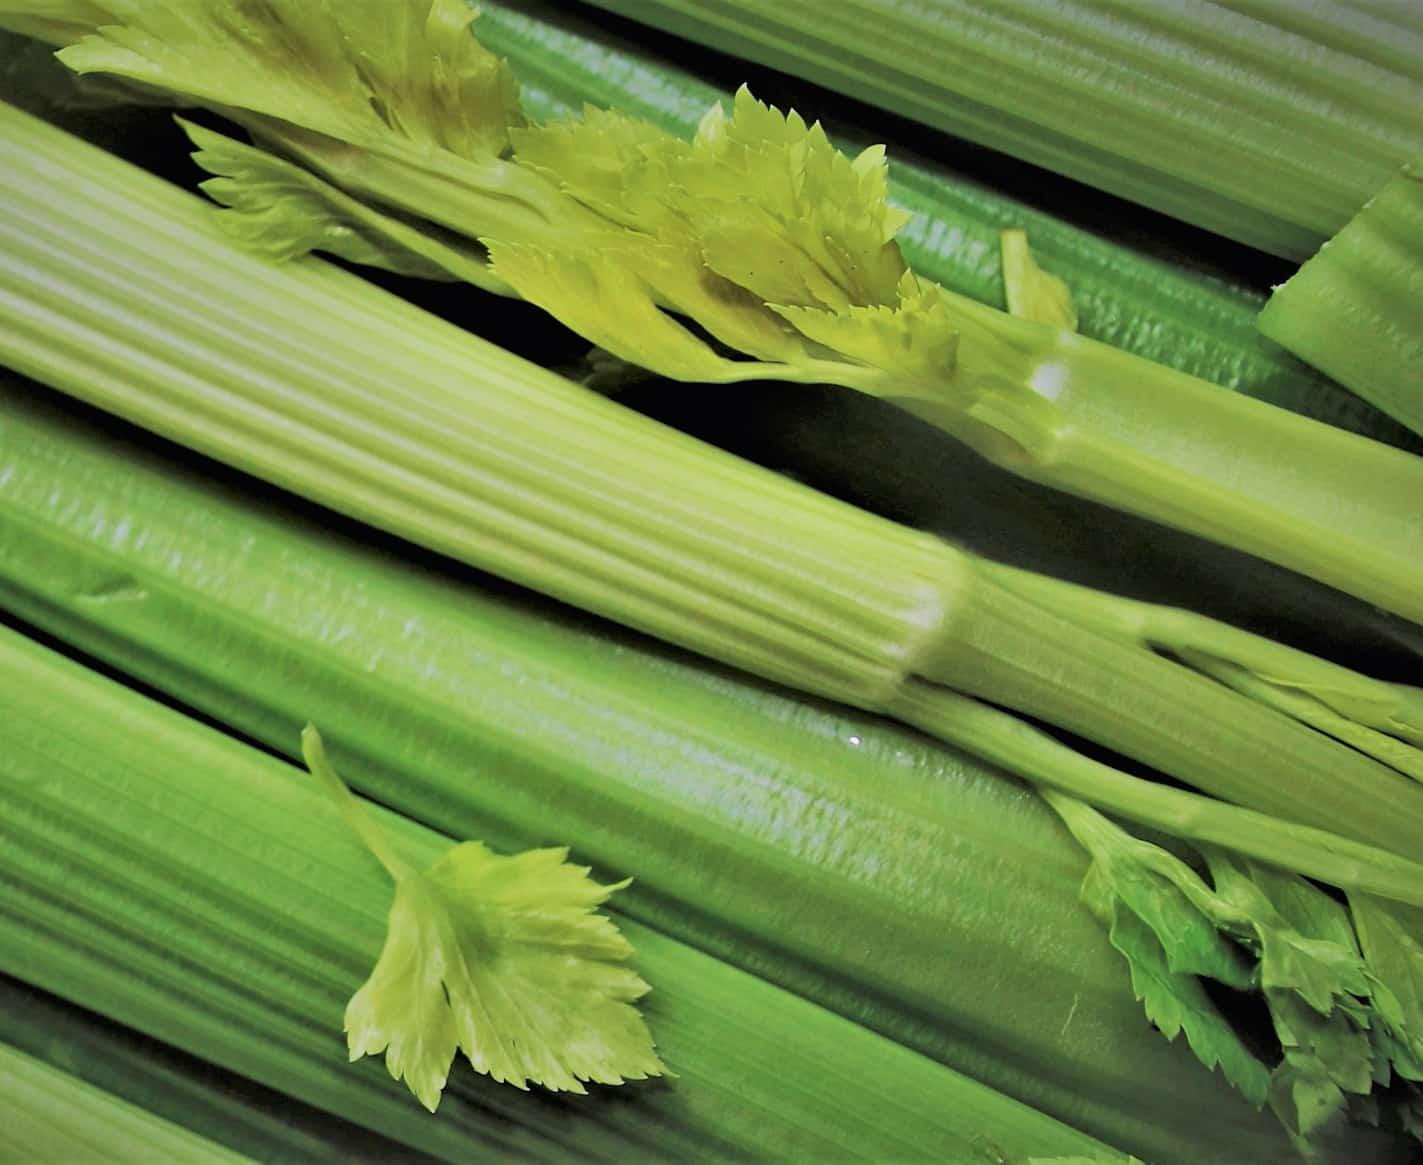 image of celery